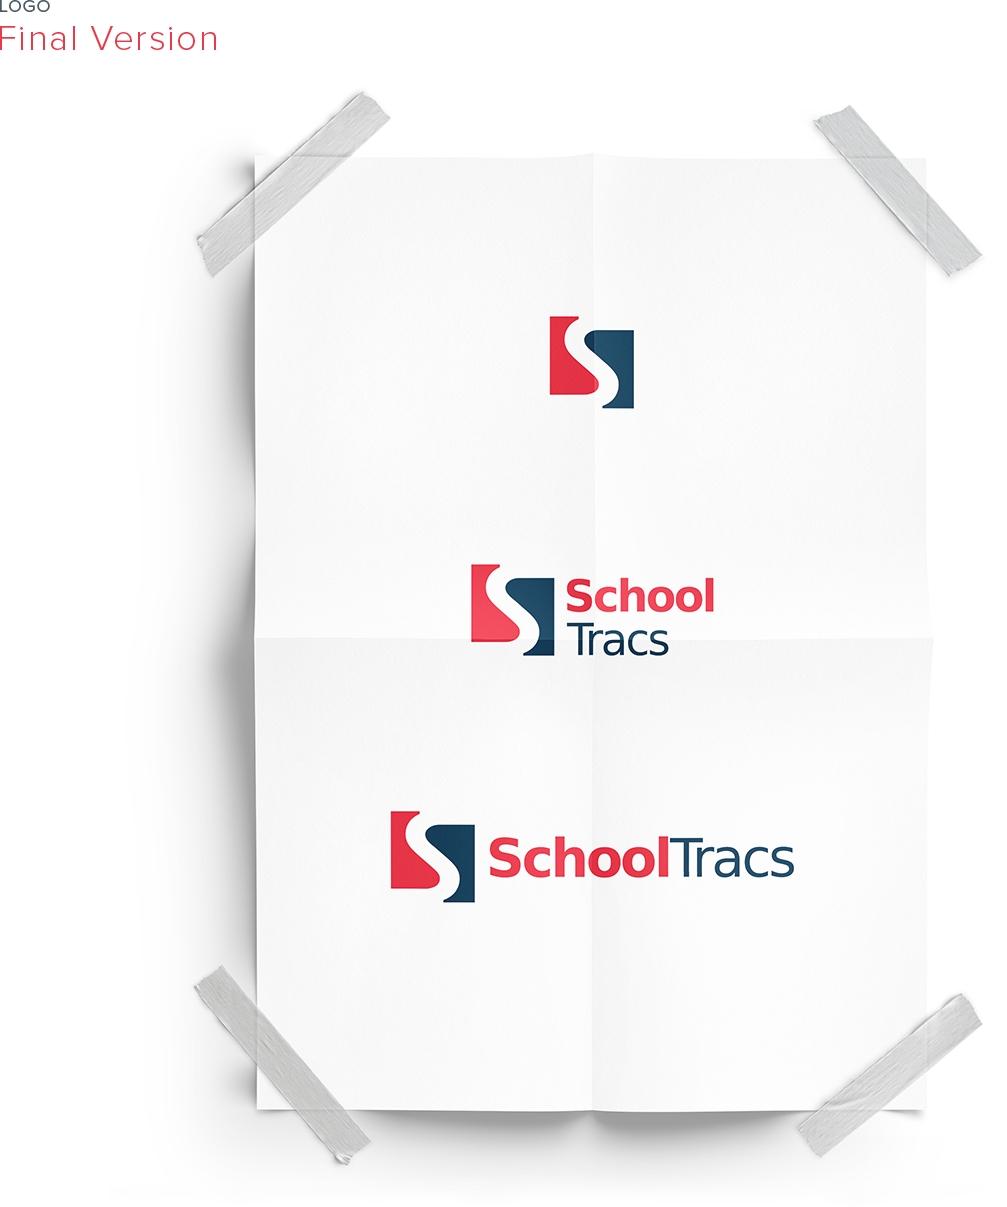 https://media.authentic-studio.com/web-content/uploads/2020/11/management-system-logo-design-final-version-schooltracs.jpg